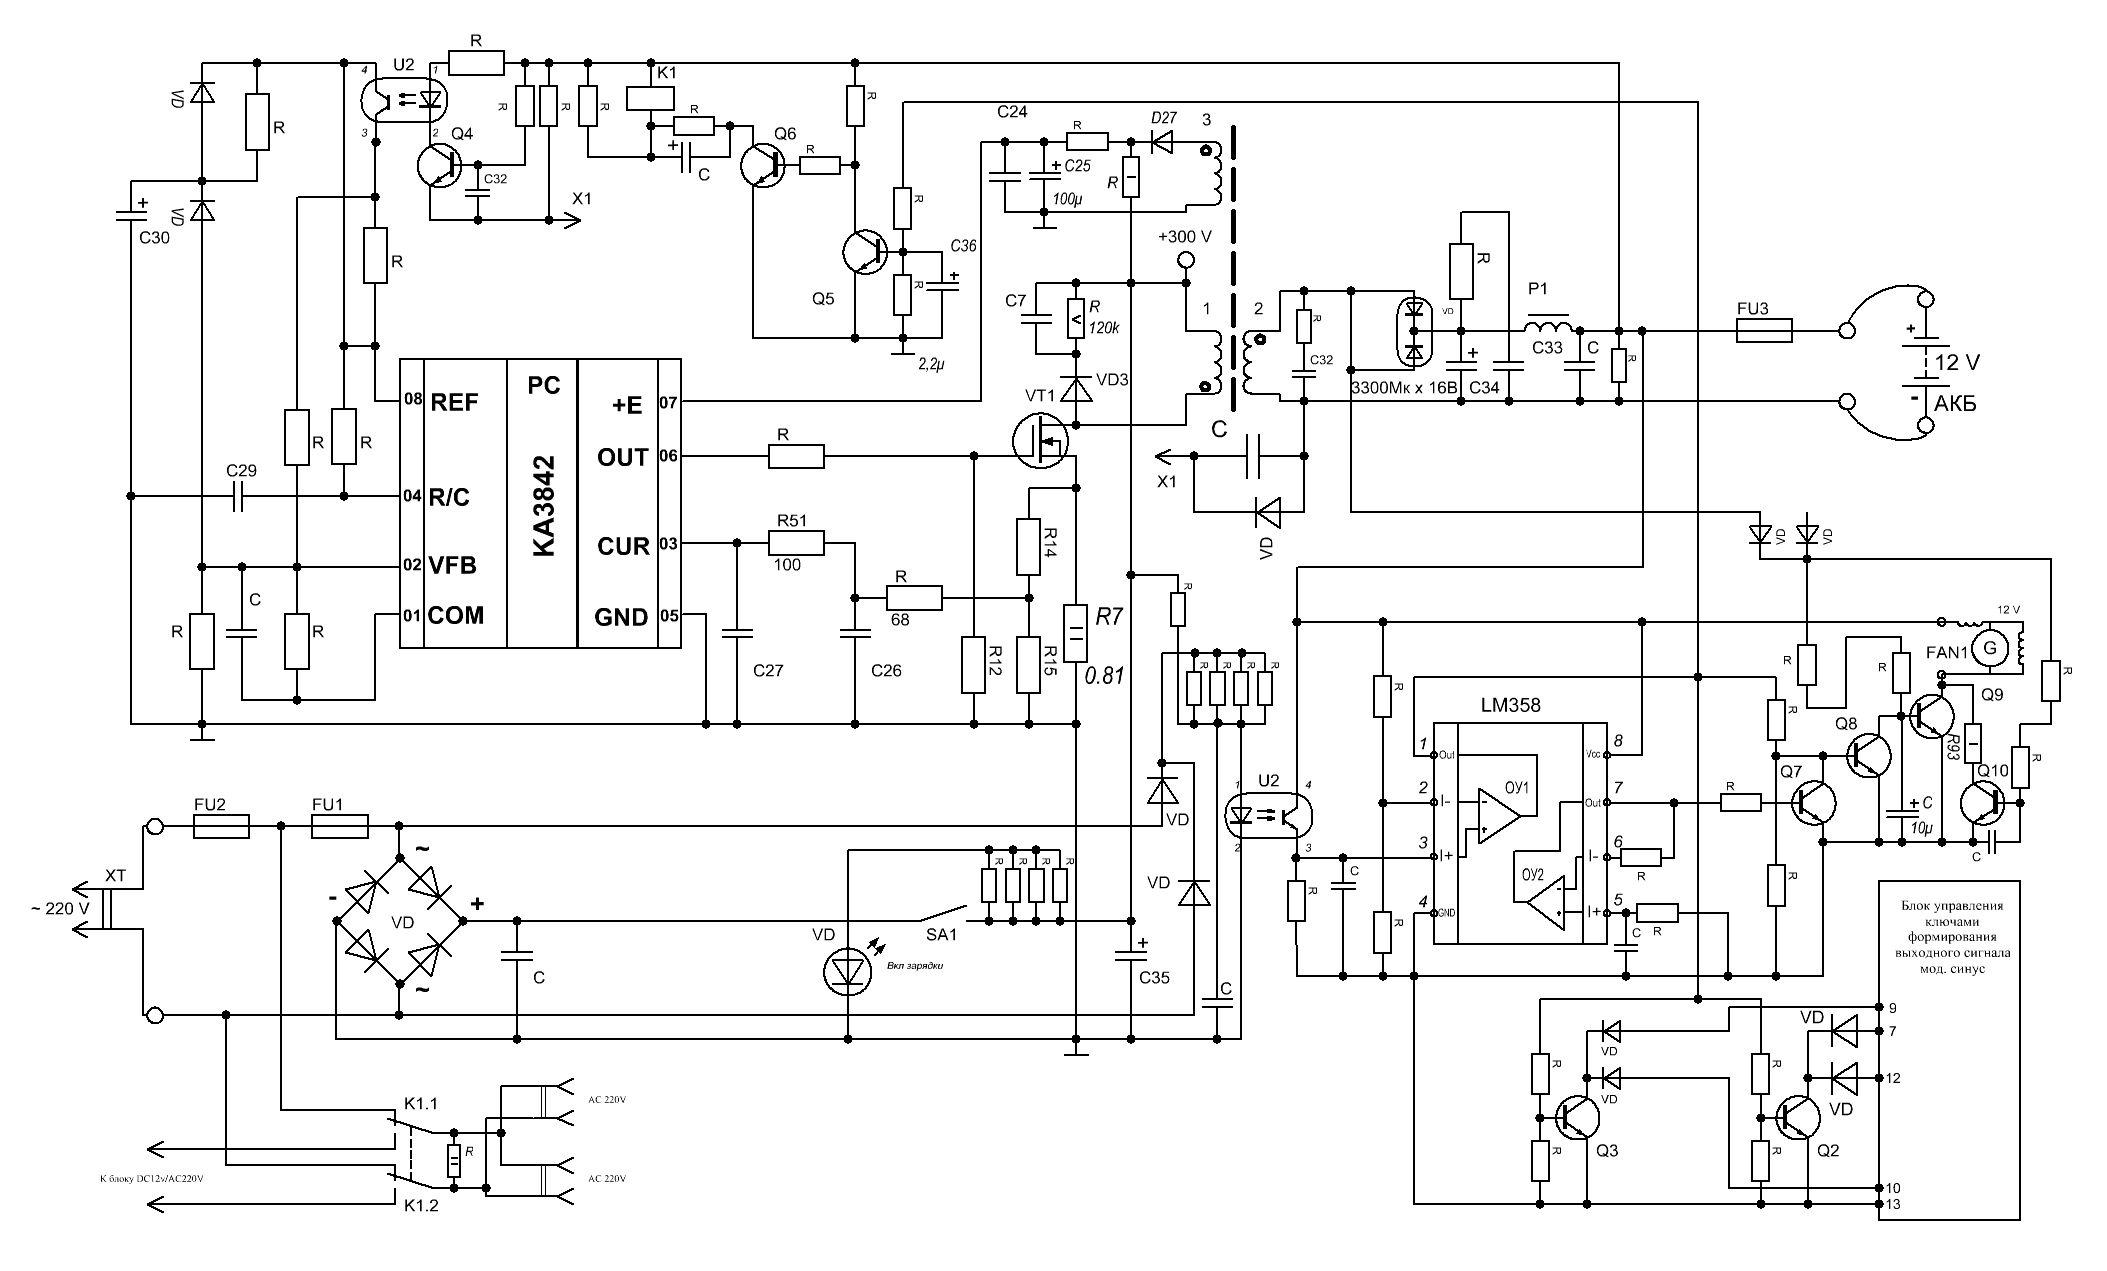 600va Ups Circuit Diagram Manual Guide Wiring Easy Power Brak Ac Na Wyj U015bciach Elektroda Pl Microtek